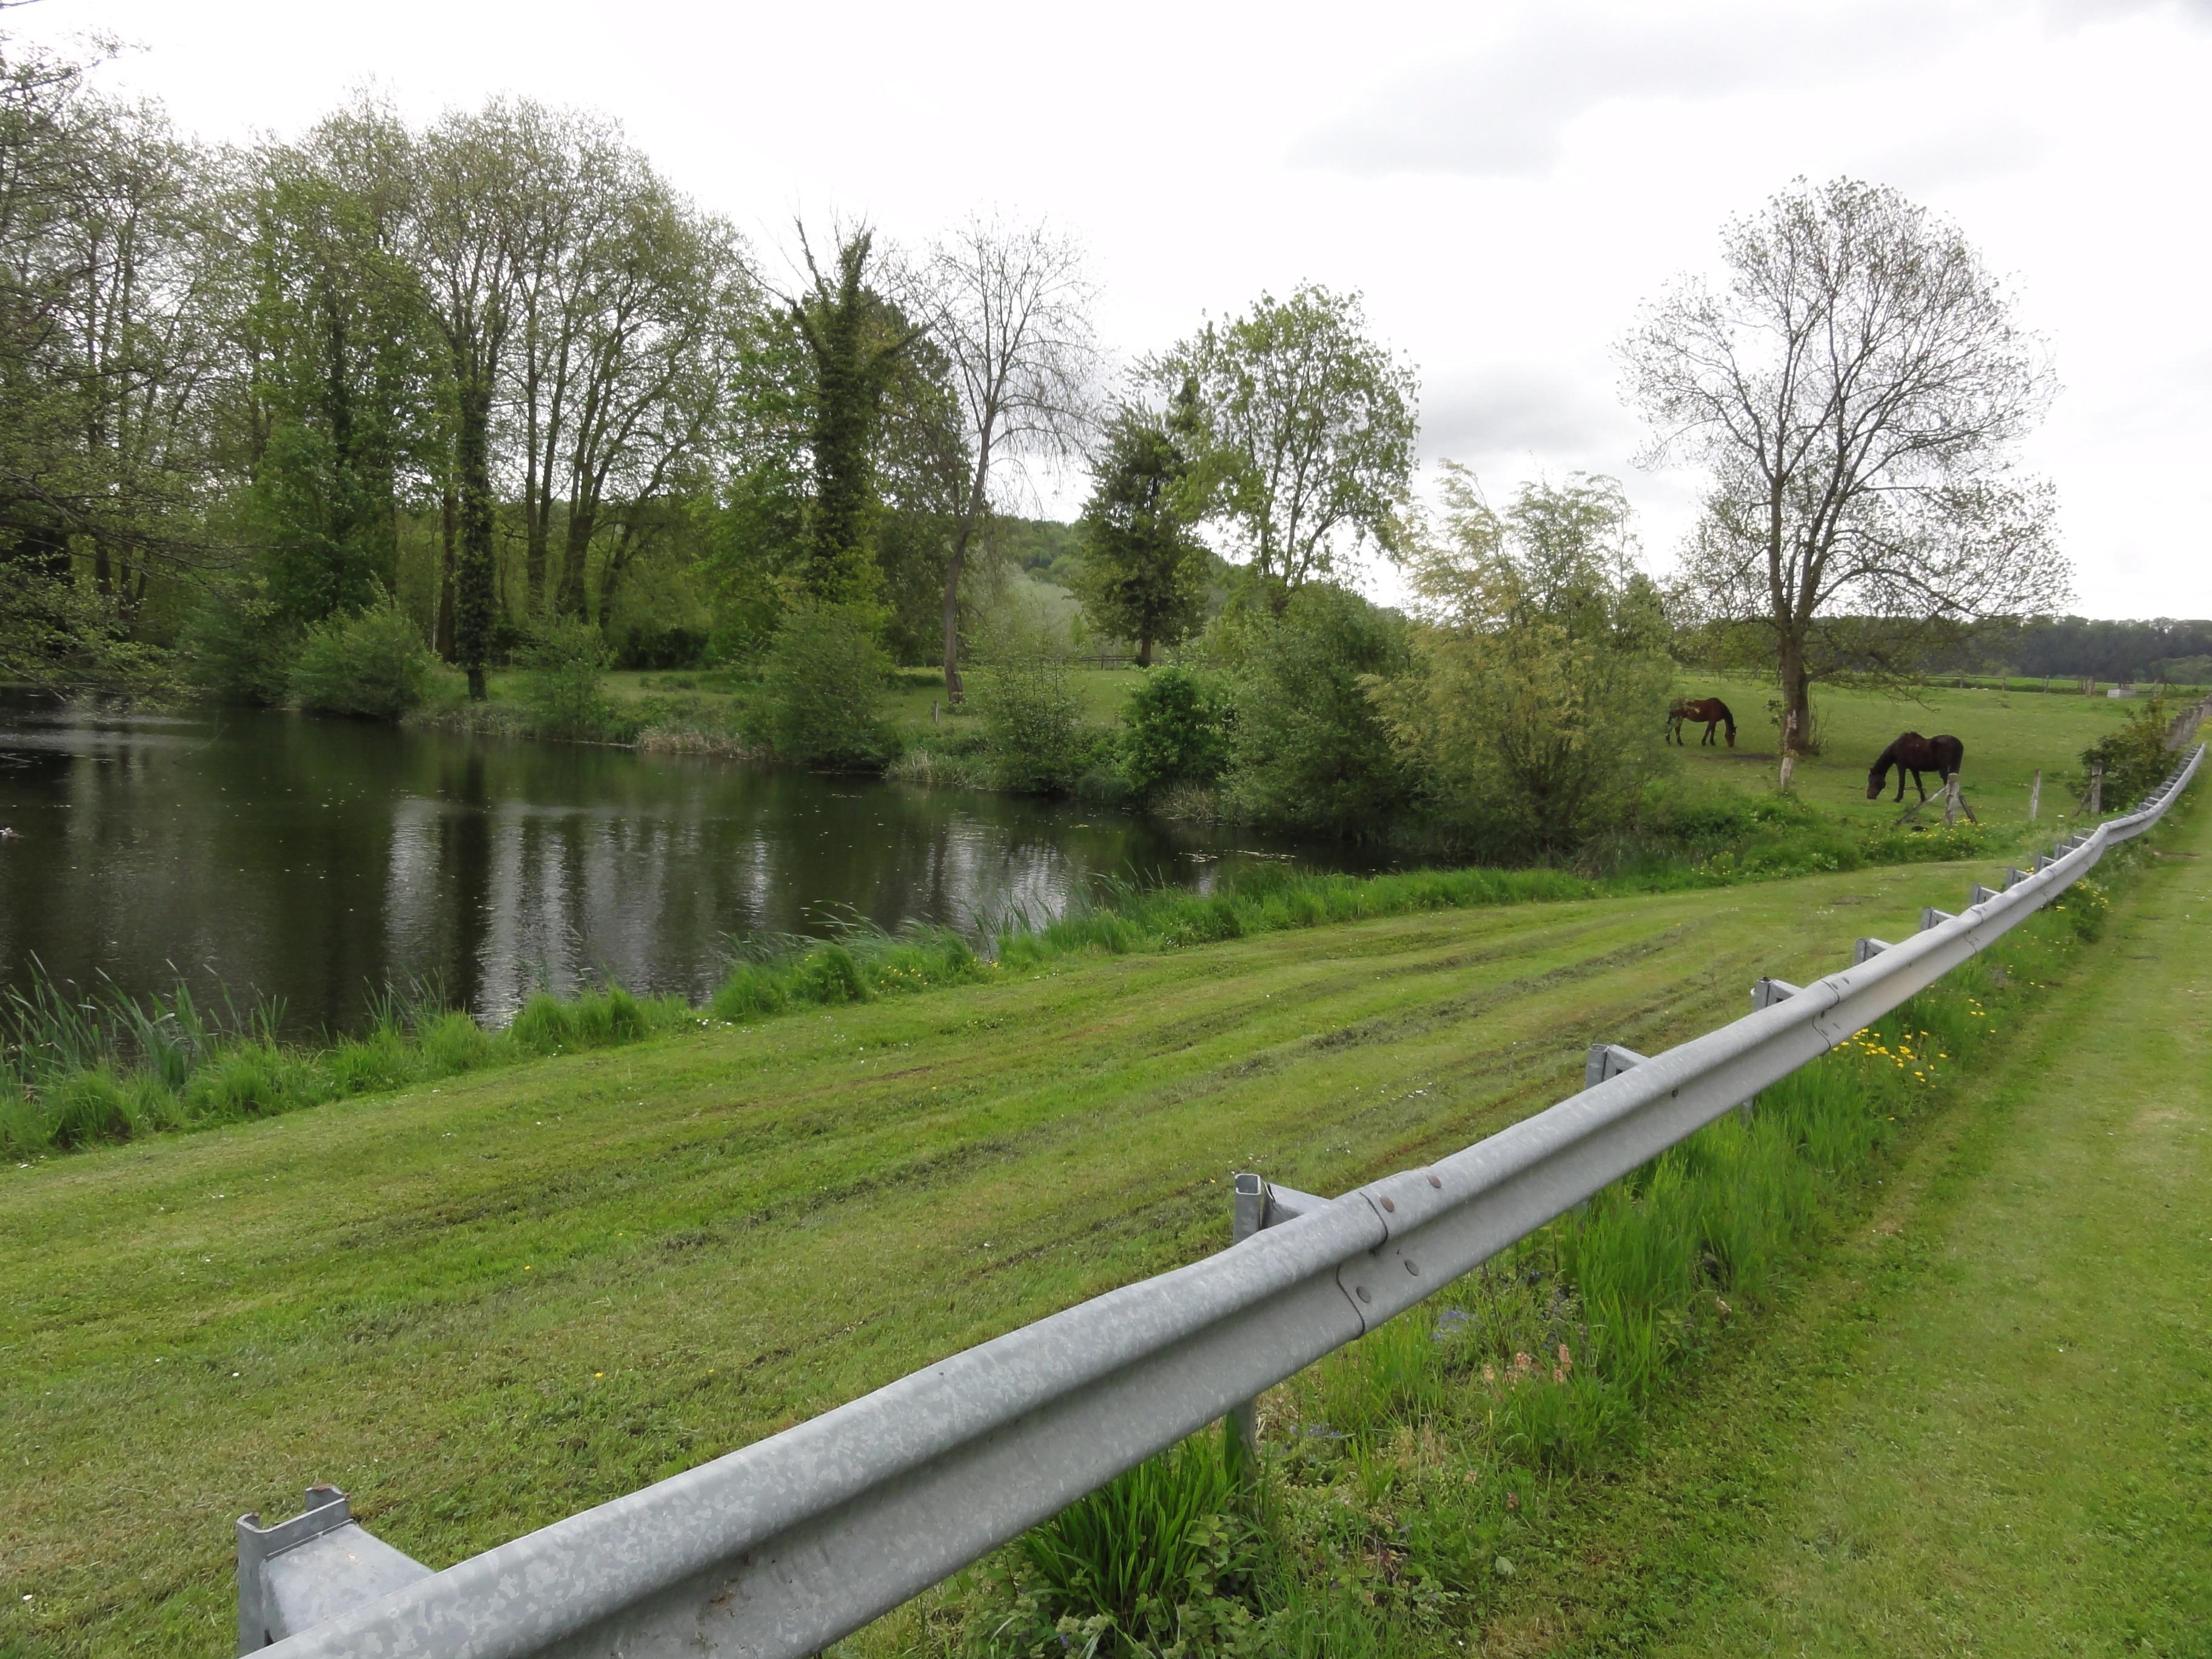 Fourdrain, Aisne, France